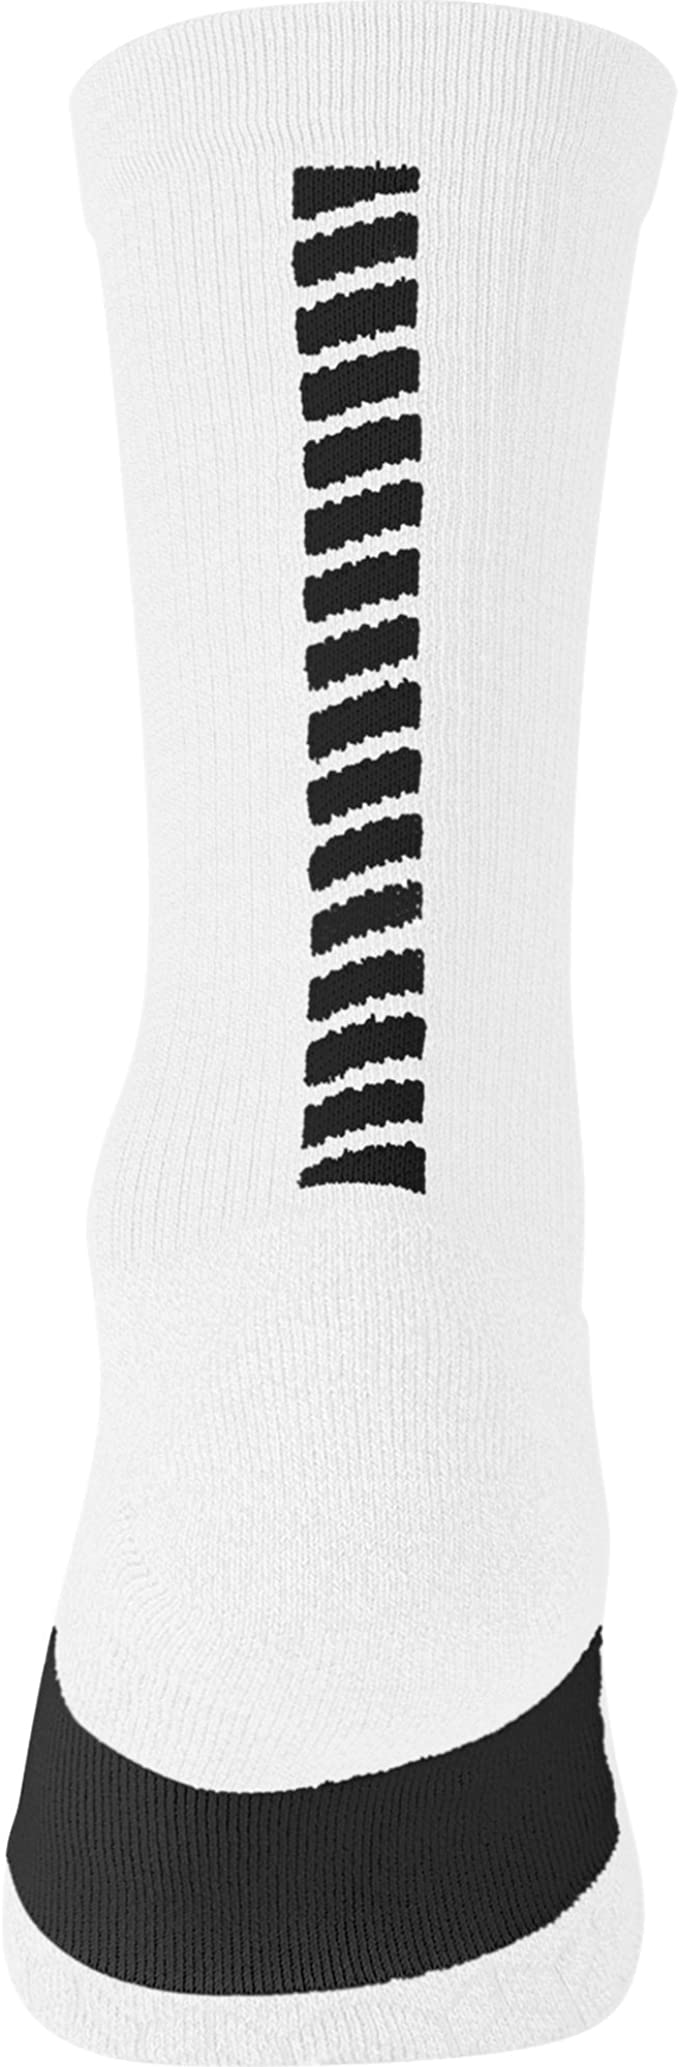 Amazon.com: NIKE Spark Cushioned Crew Running Socks (1 Pair ...